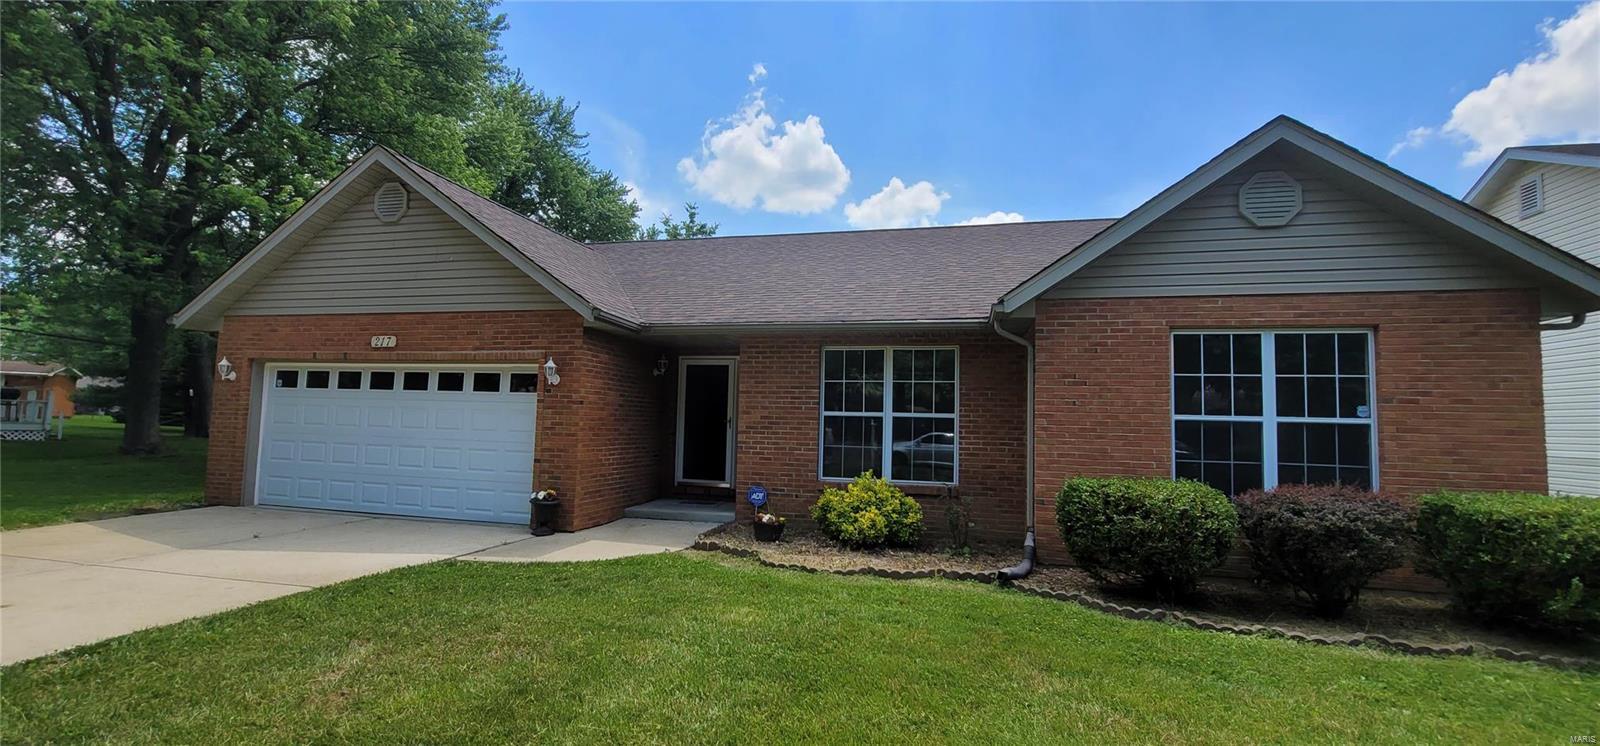 217 Sheffield Drive Property Photo - Belleville, IL real estate listing